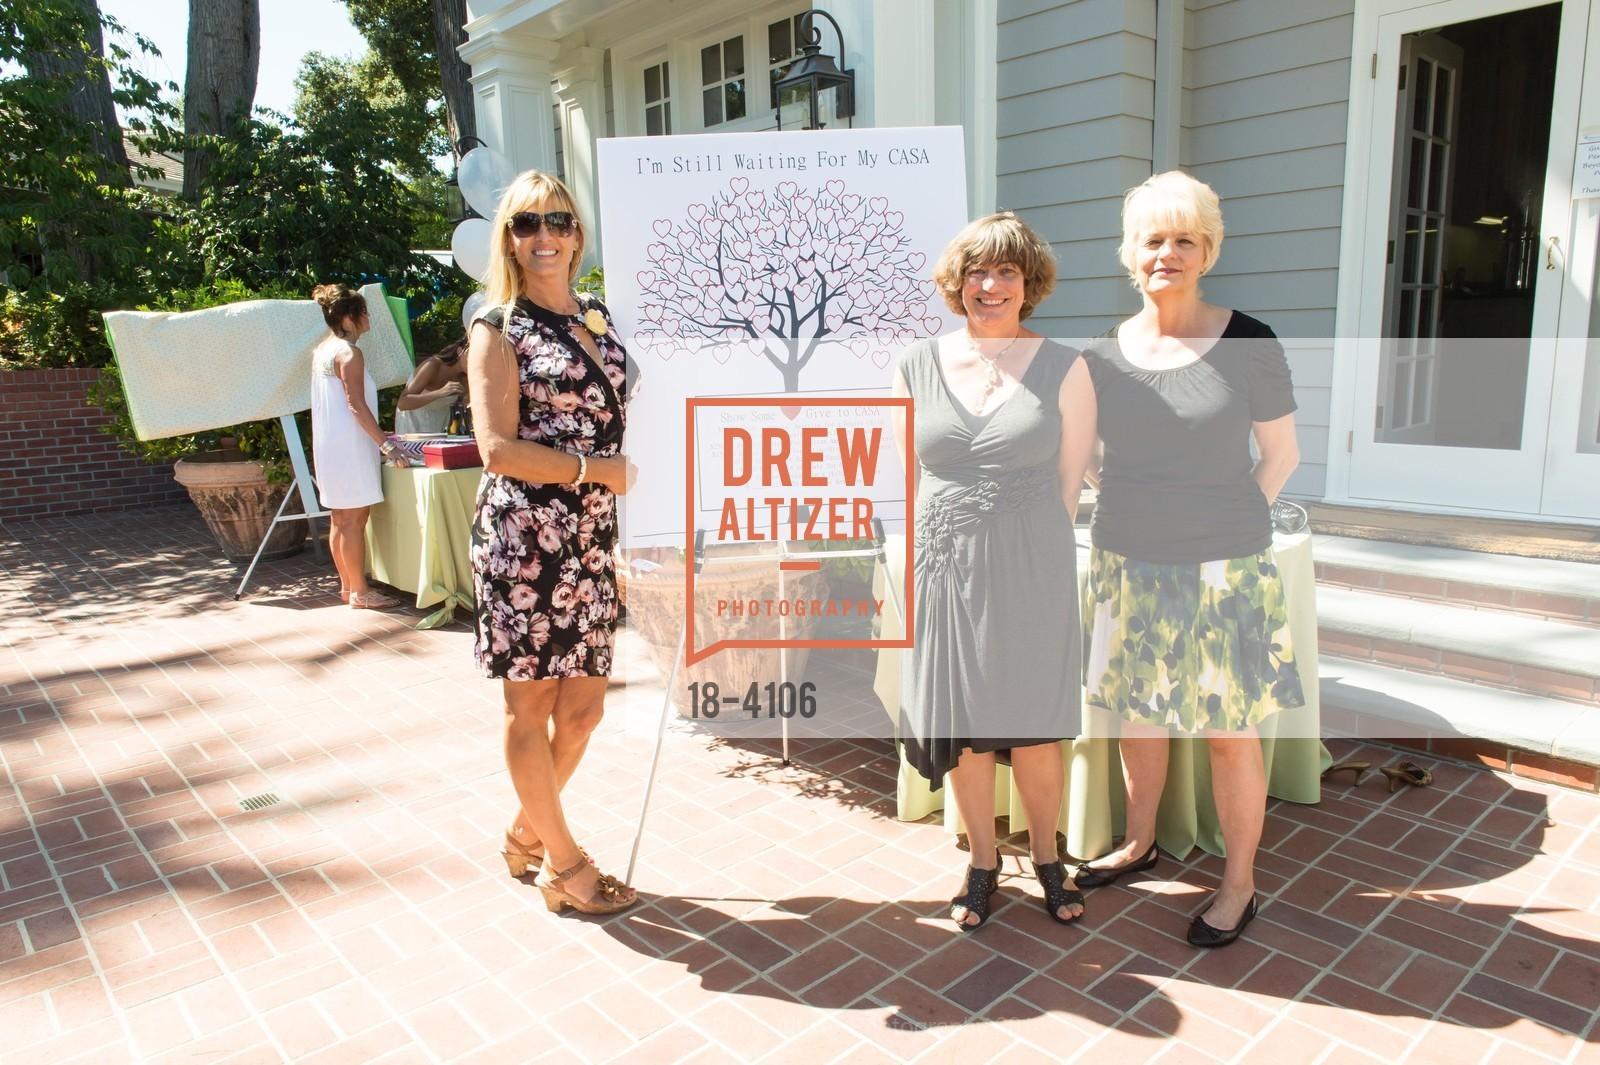 Brigitte Greenstone, Chloe D'Apice, Pat Miljanich, Photo #18-4106